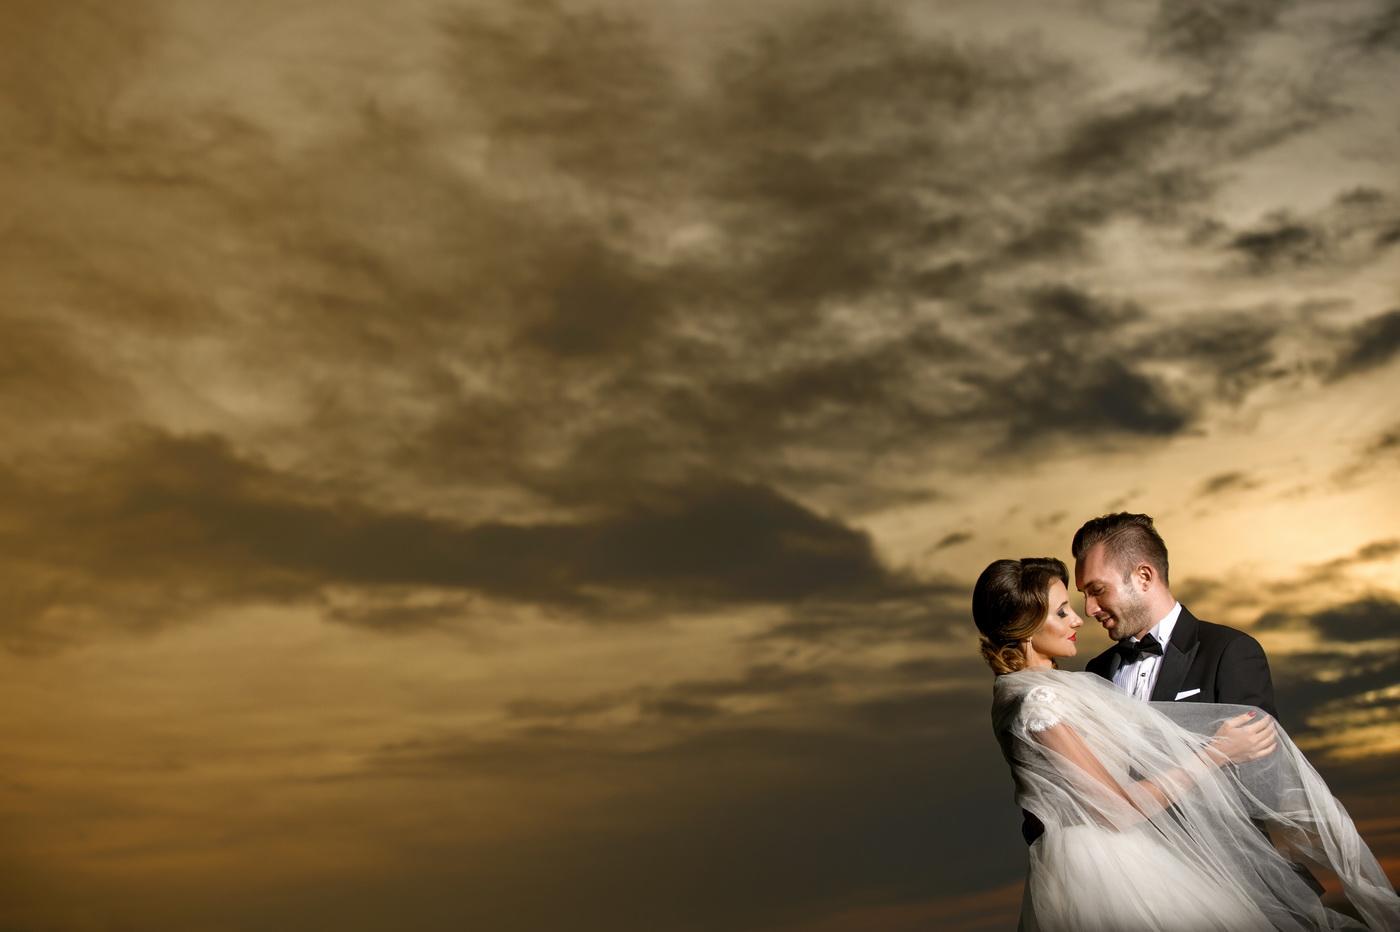 Destination Wedding Photographer_Marian Sterea_067.jpg